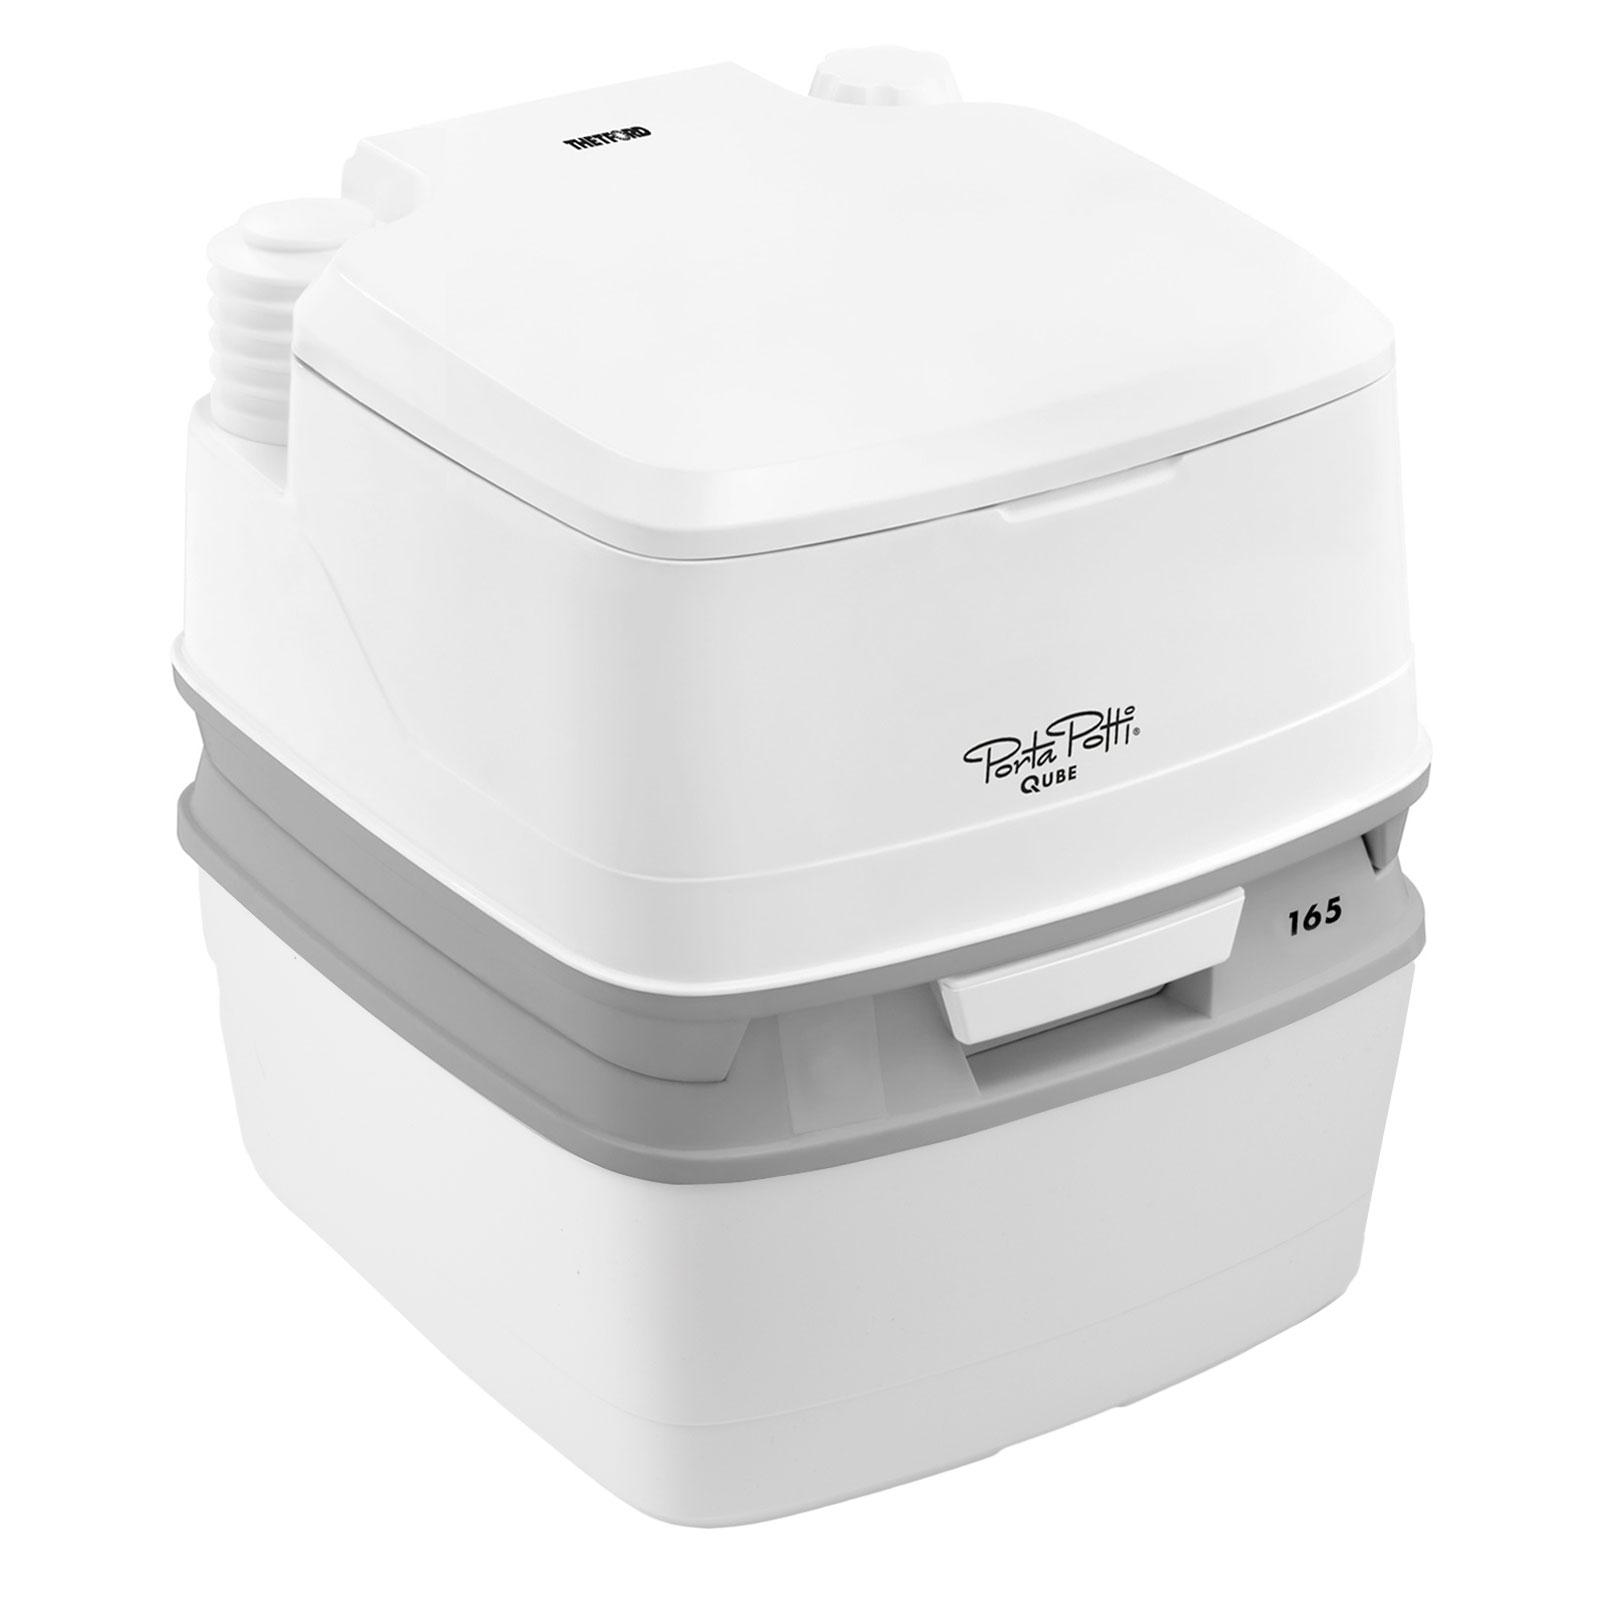 Thetford porta potti qube 165 campingtoilette 21 ltr abwassertank f r wohnwagen ebay - Camping toilette fur gartenhaus ...